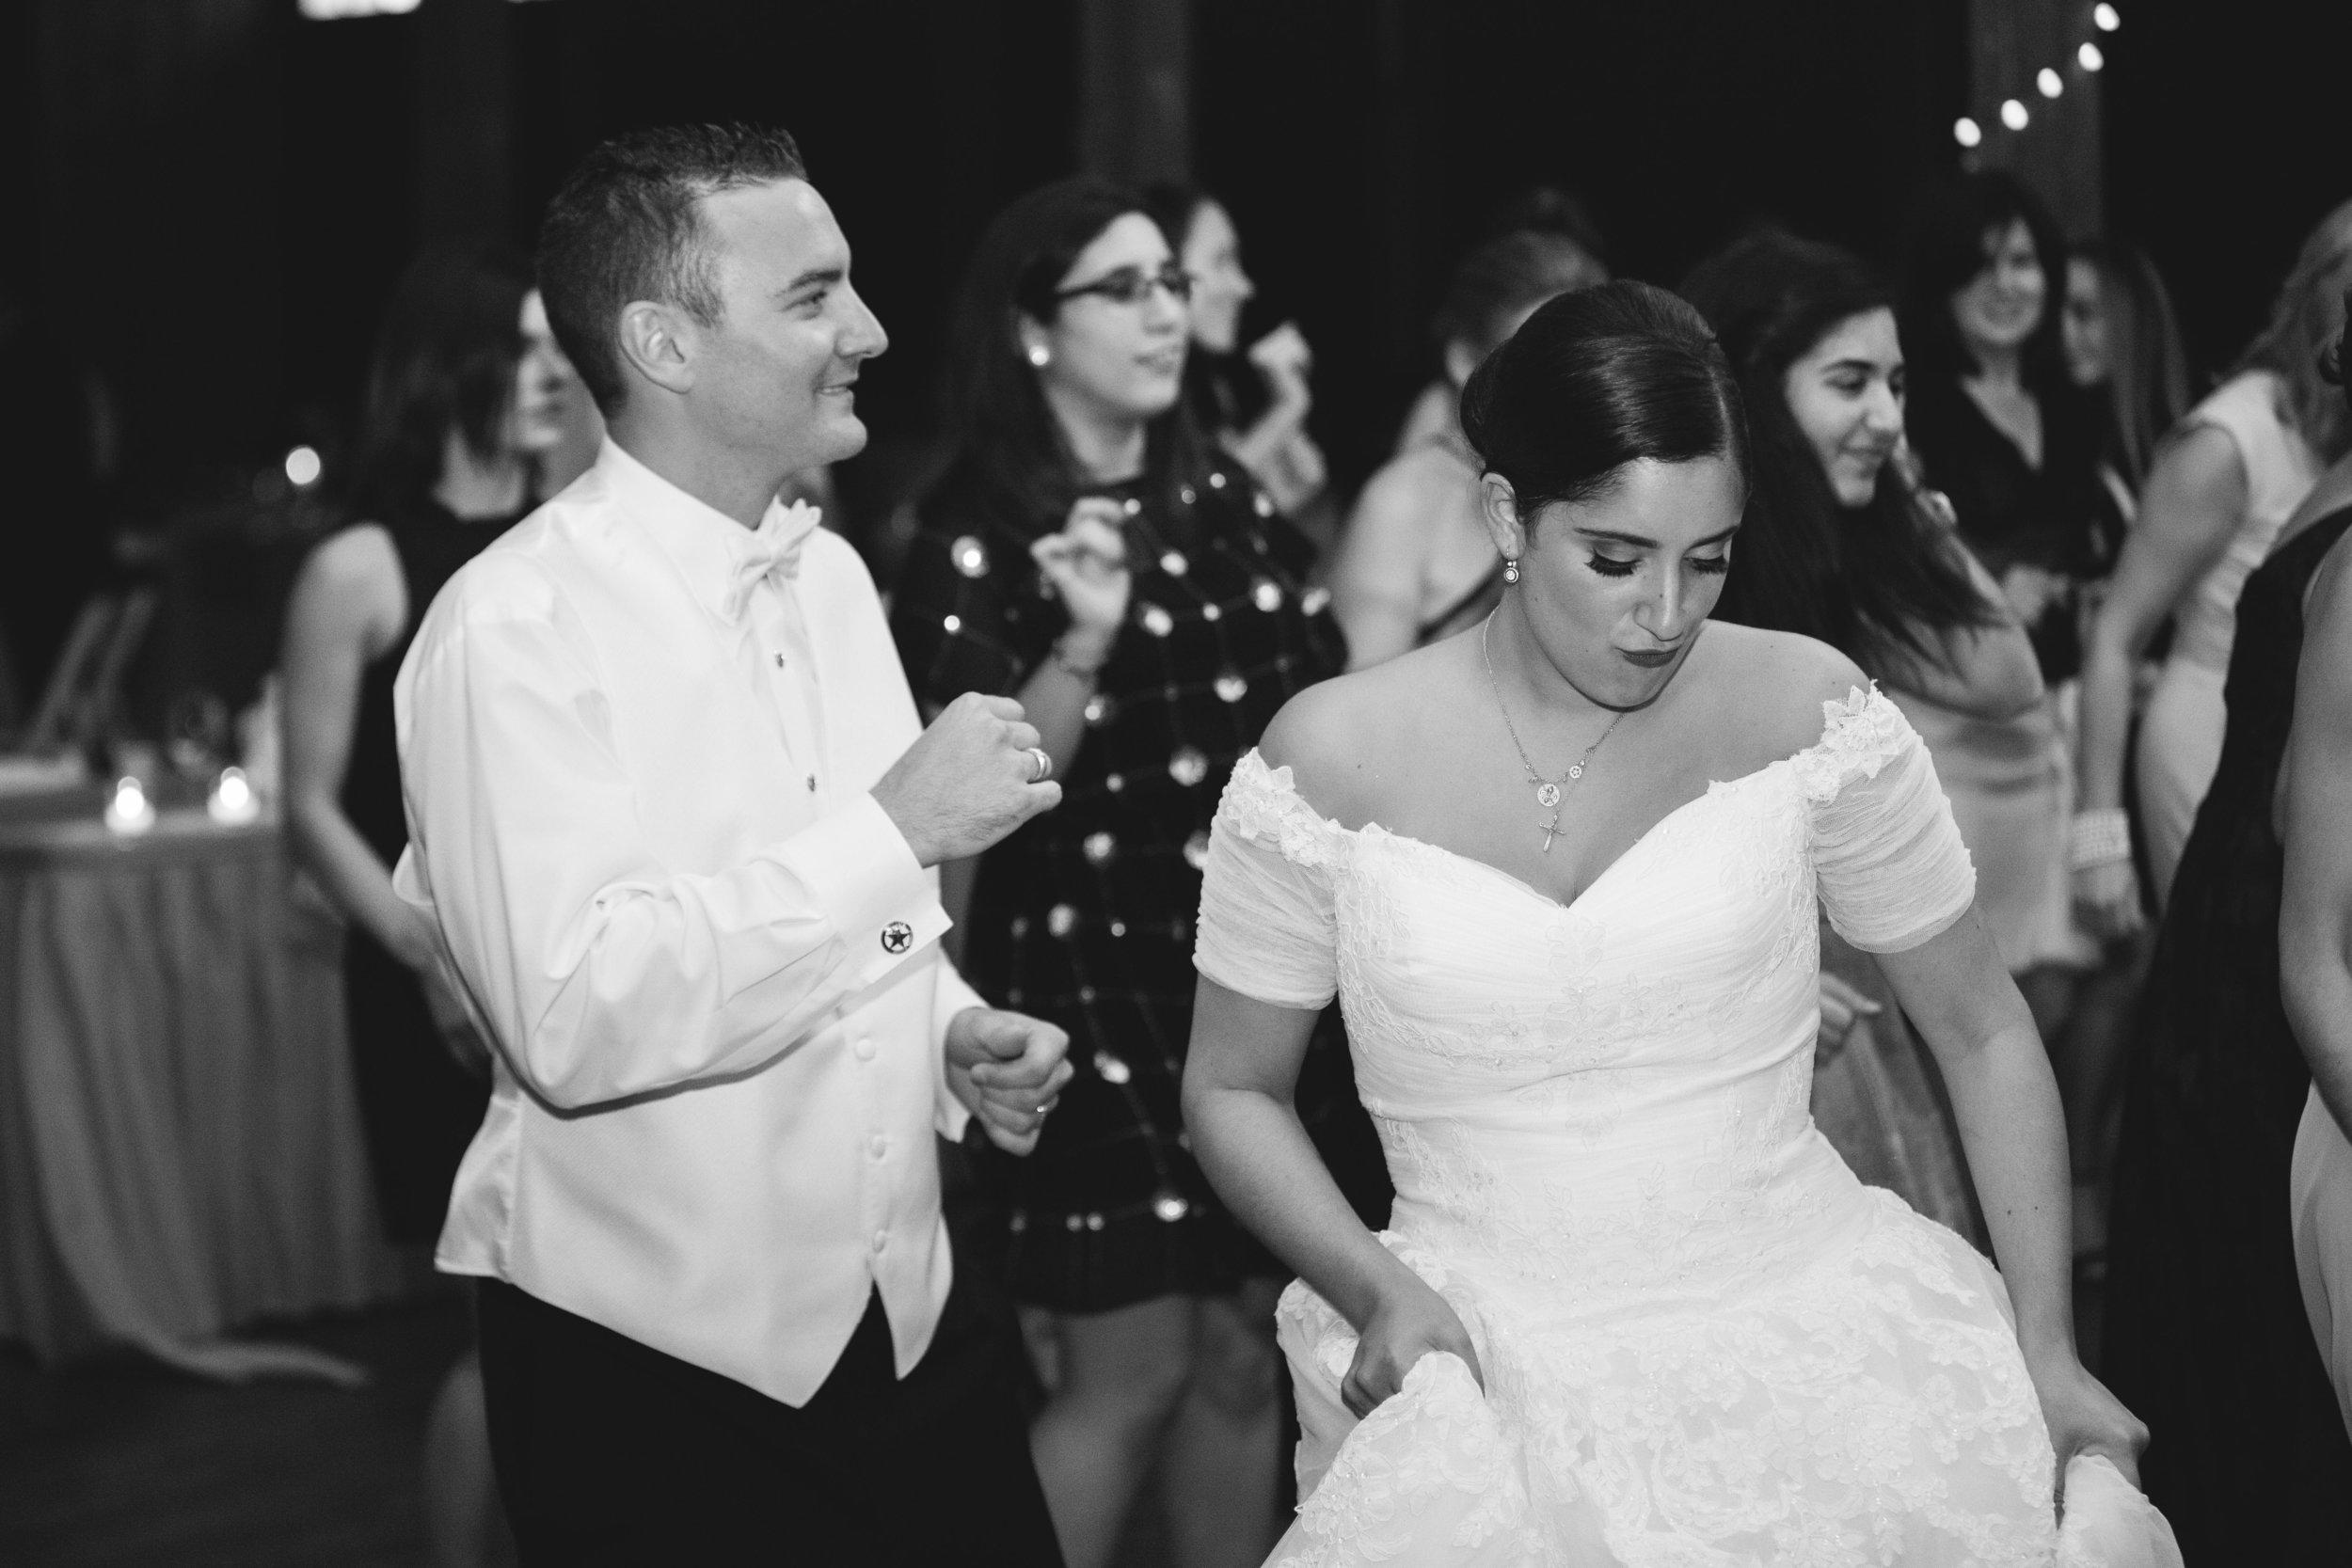 ATGI_Magali & Josh Wedding1_2S8A1914.jpg